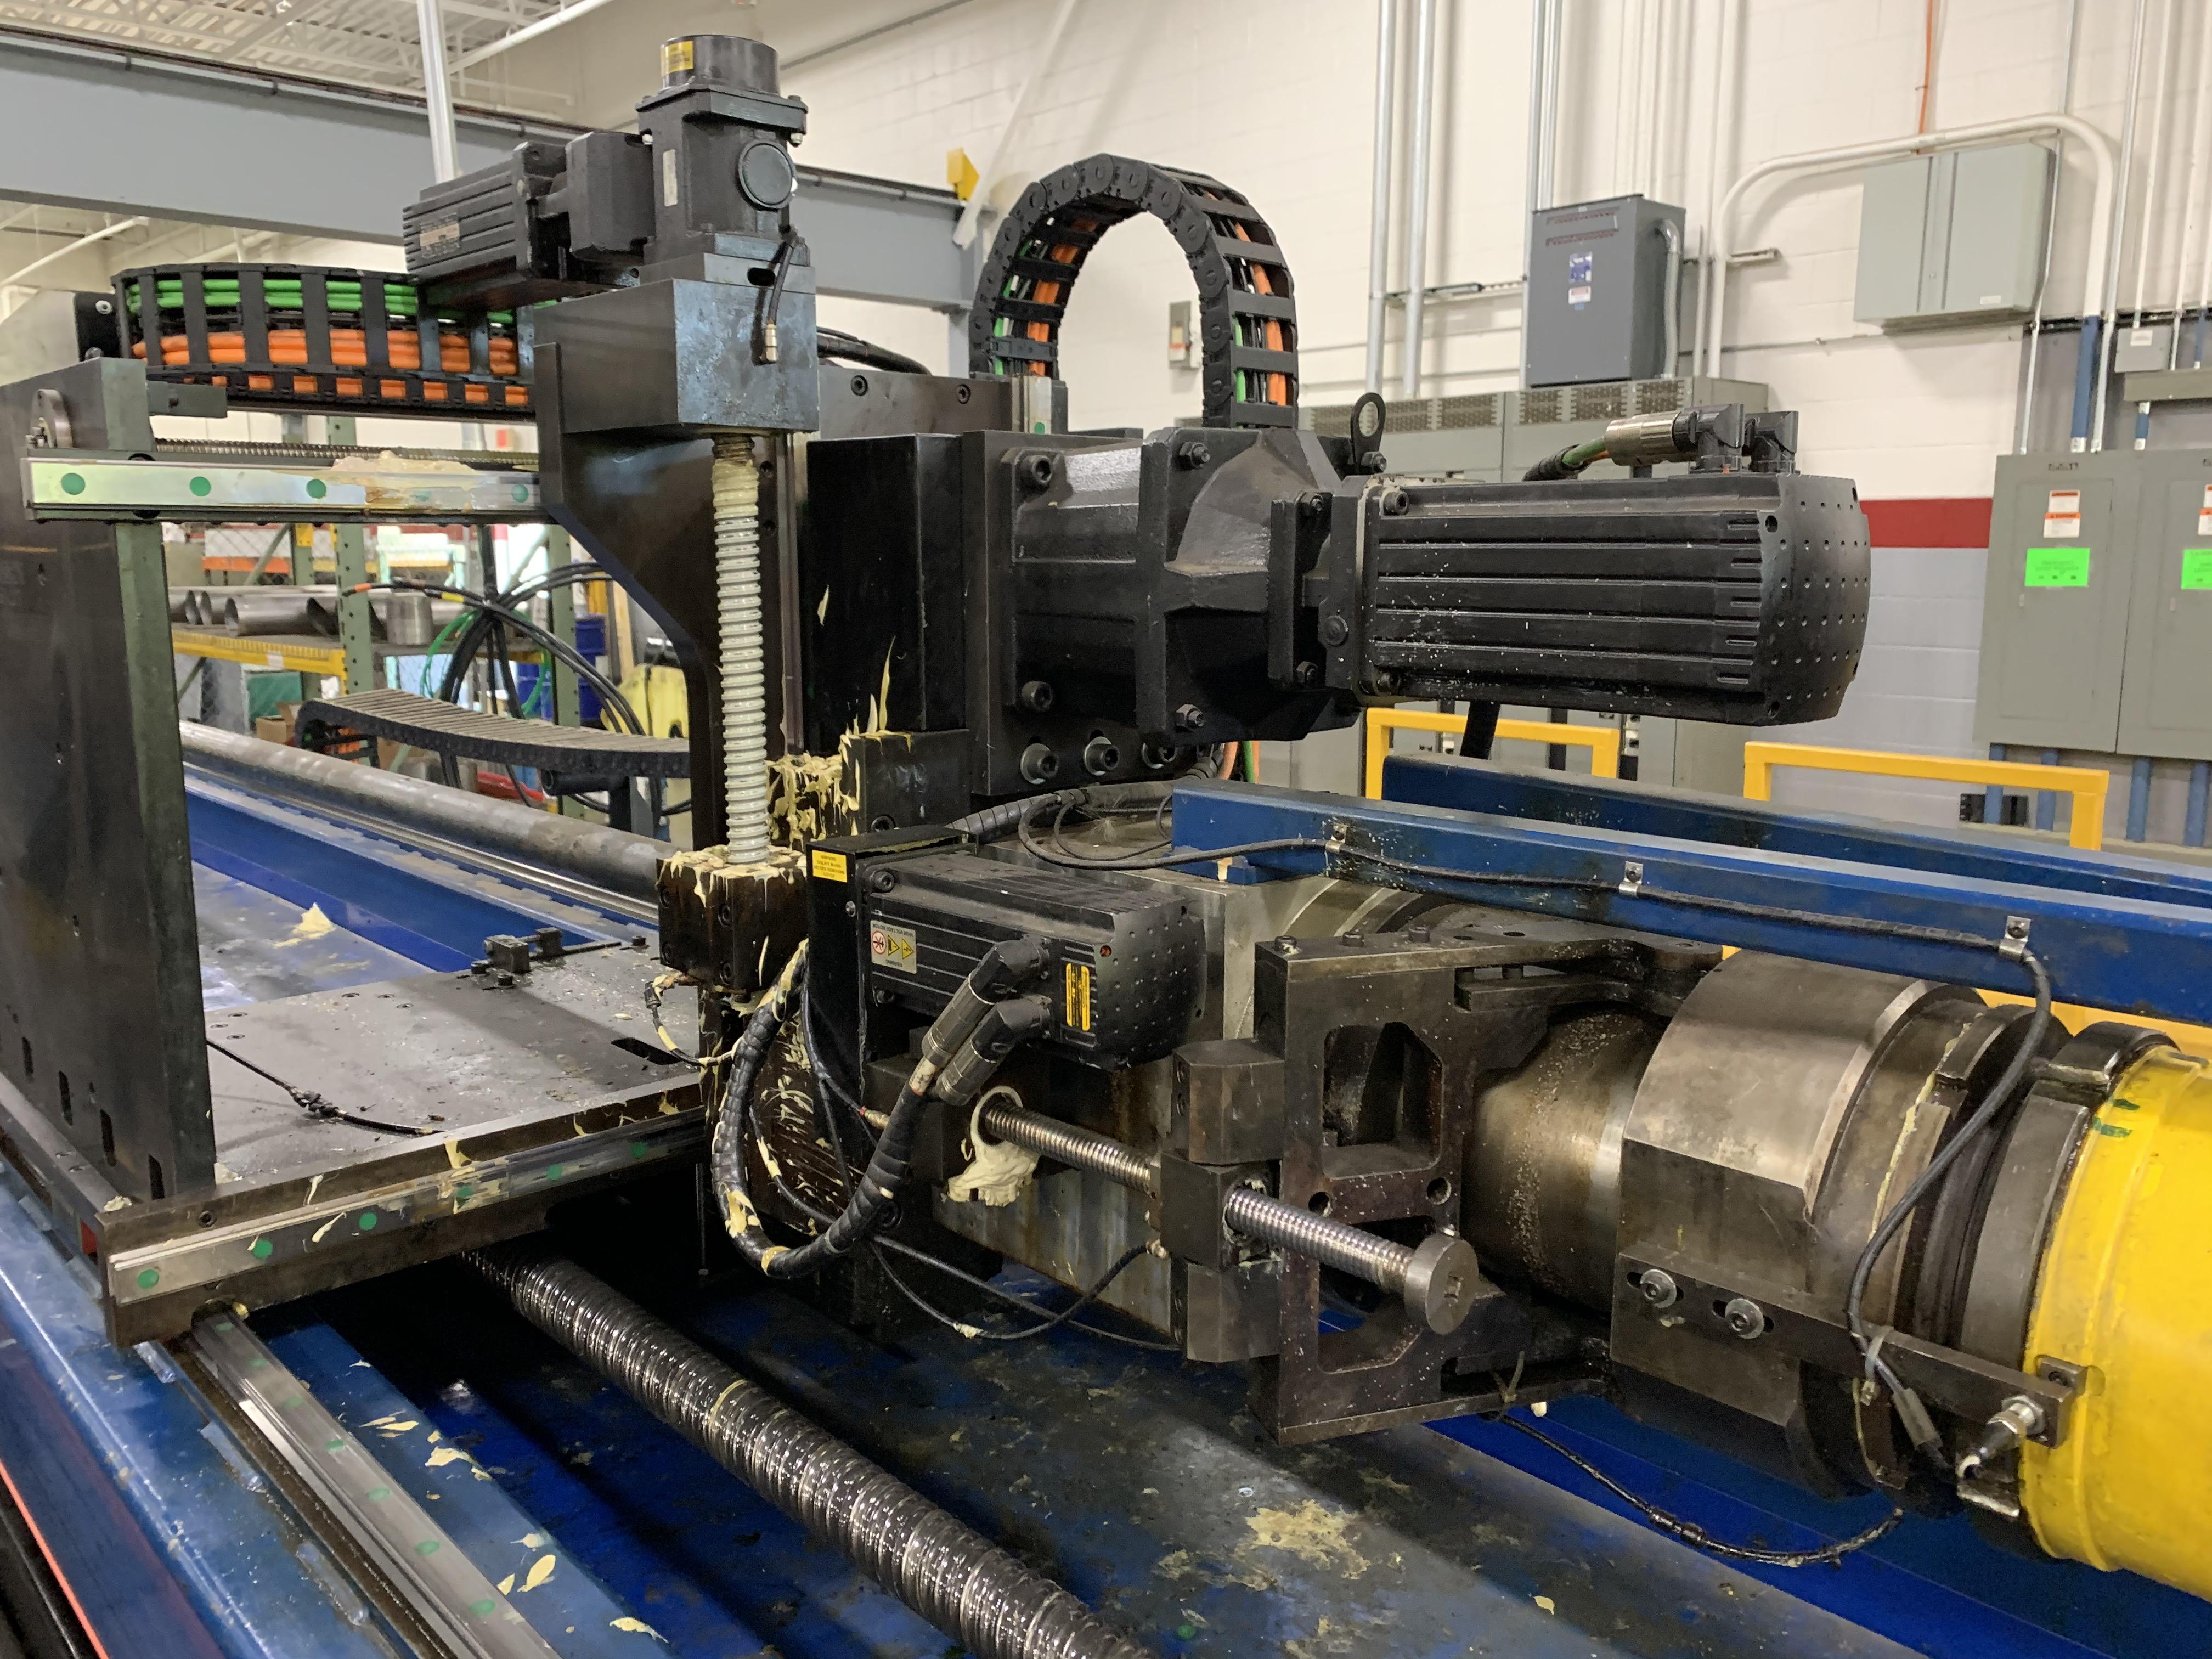 "6"" UNISON MODEL 6"" MS RH ELECTRIC CNC MULTI-STACK TUBE BENDER; S/N 2715, JOB NO. ME 4-410,(NEW 2014) - Image 18 of 72"